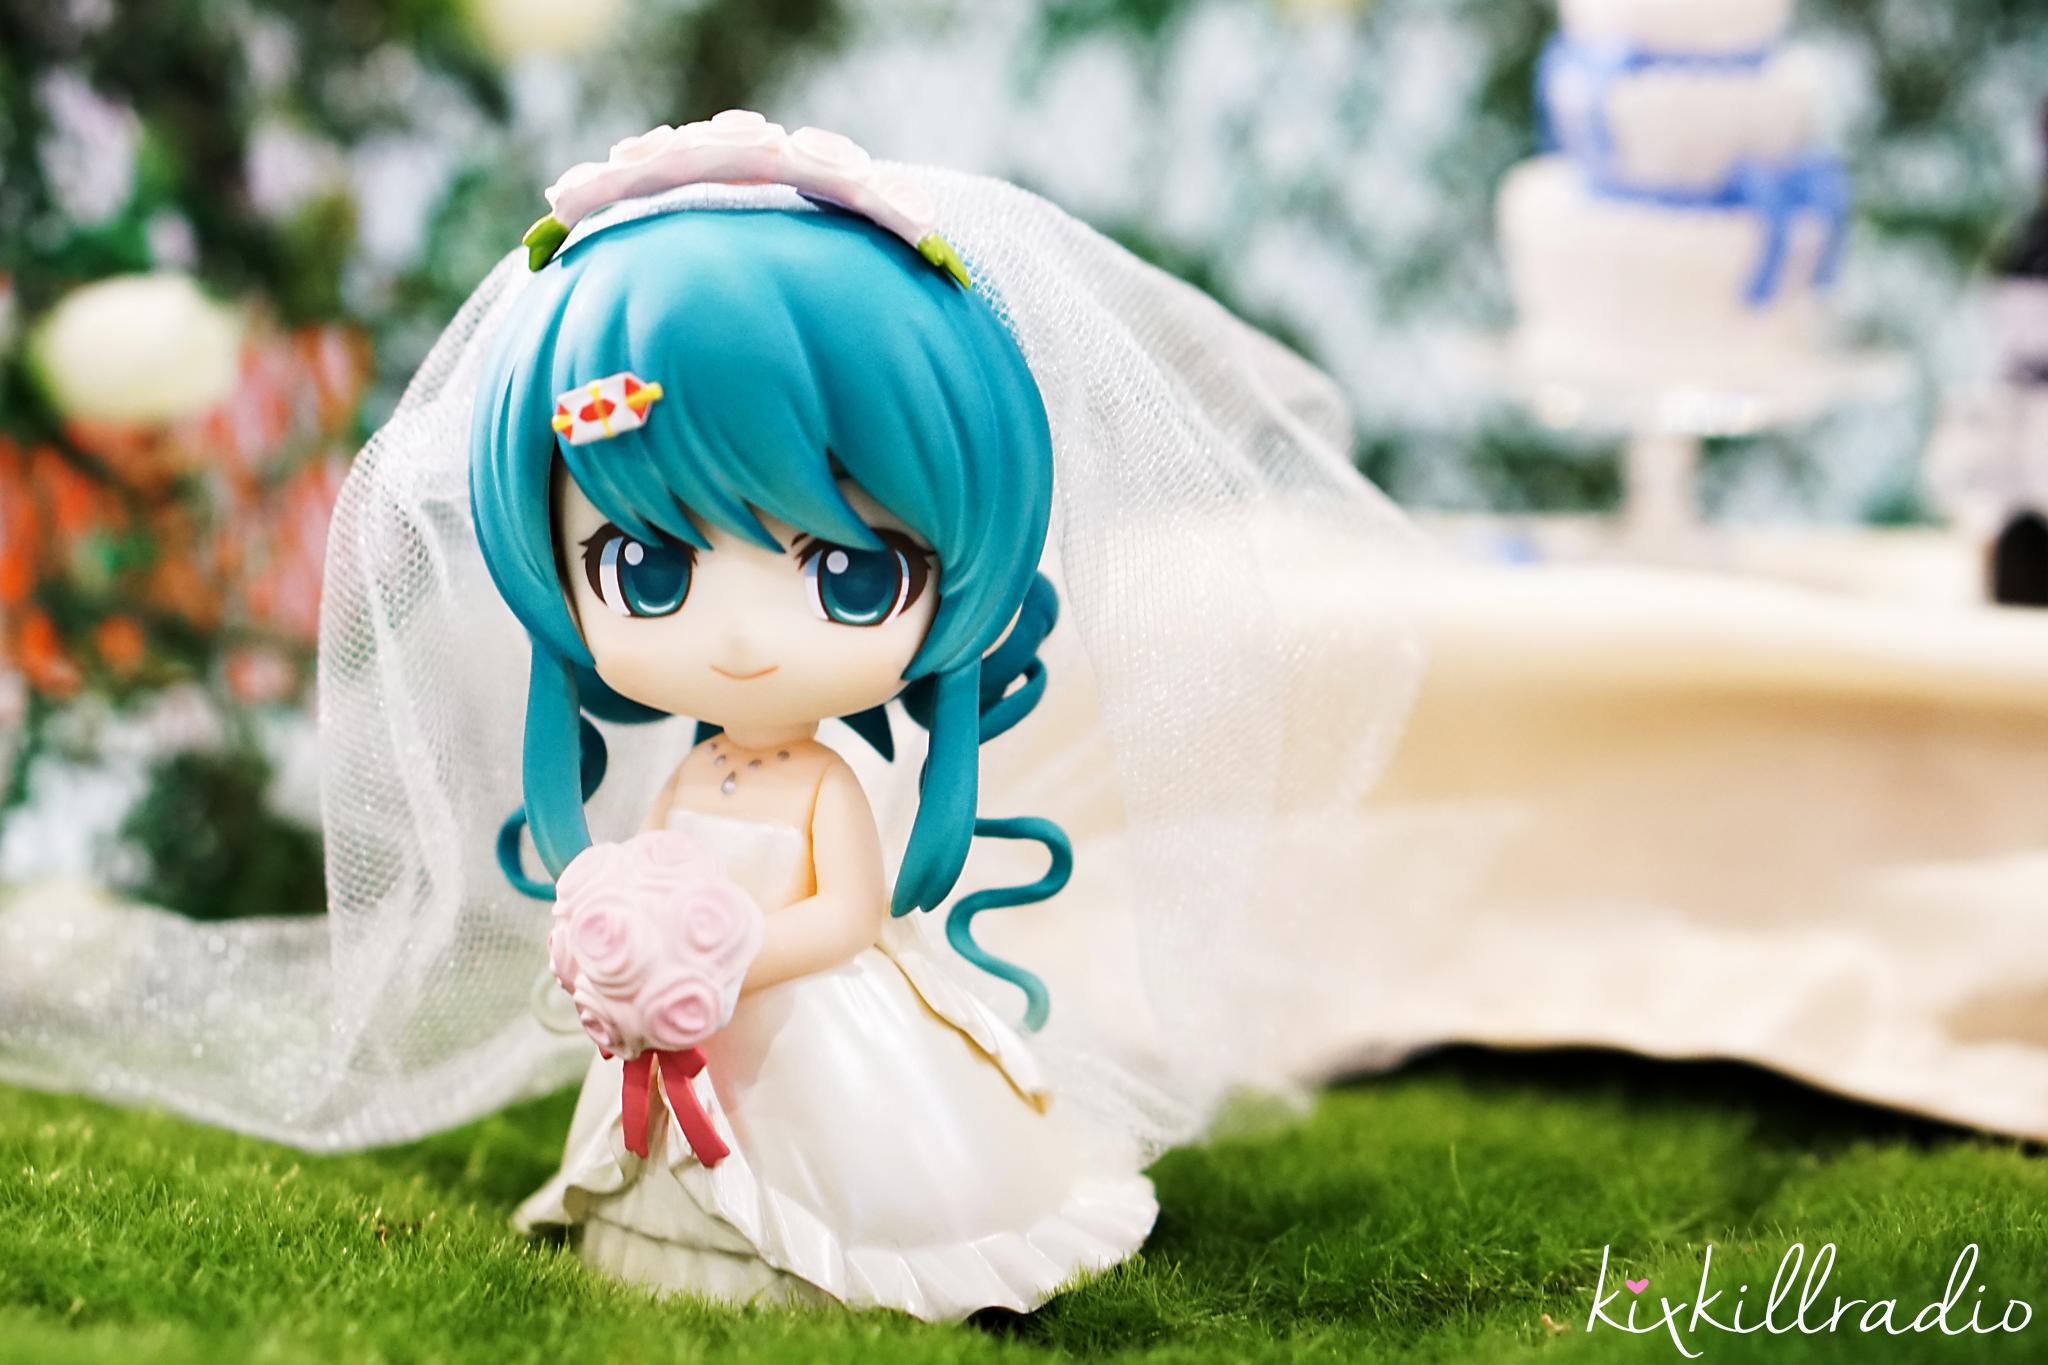 Wedding Diorama set up at Sony Workshop